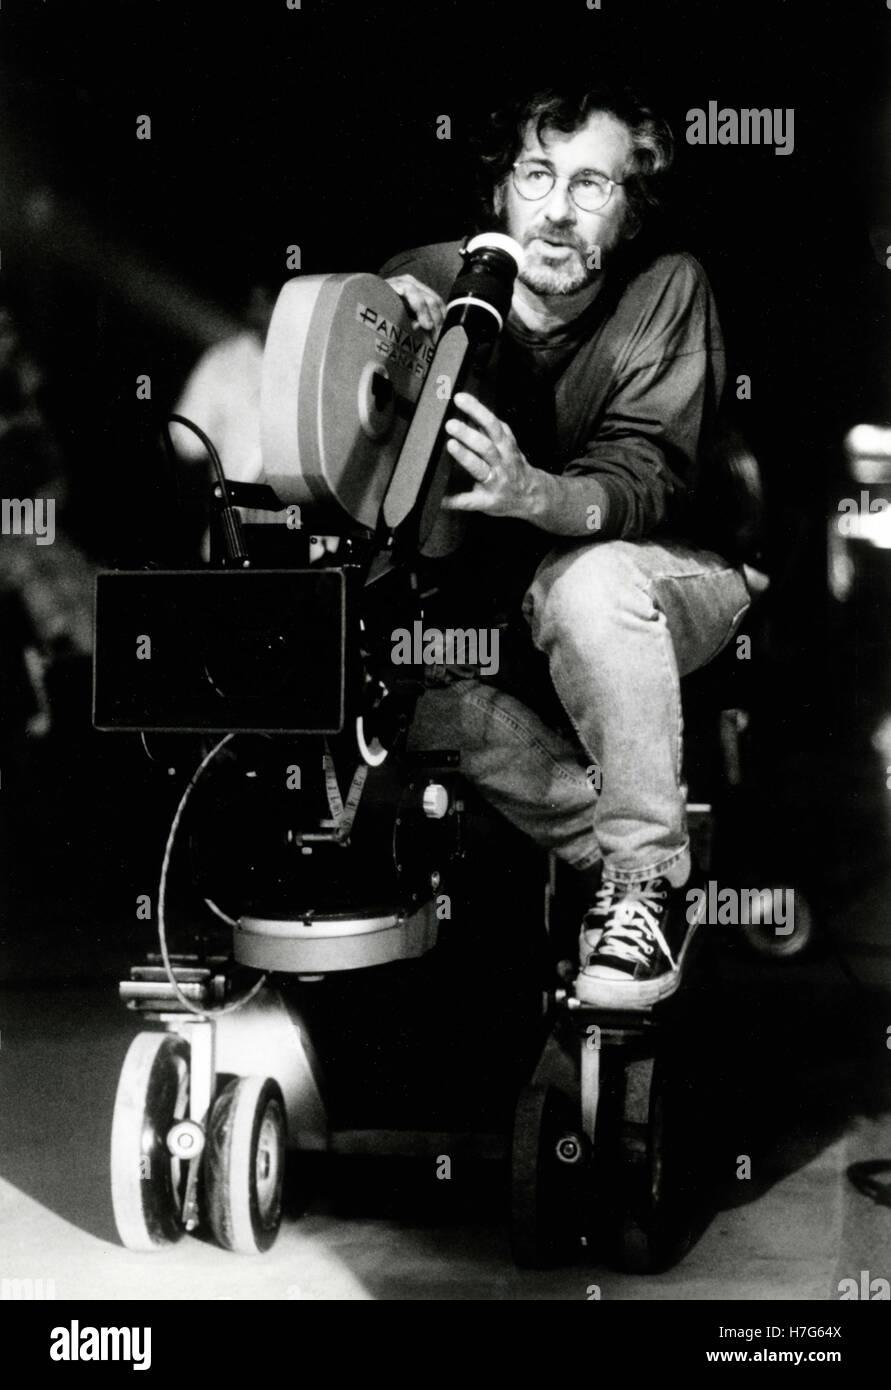 Movie director Steven Spielberg, USA - Stock Image